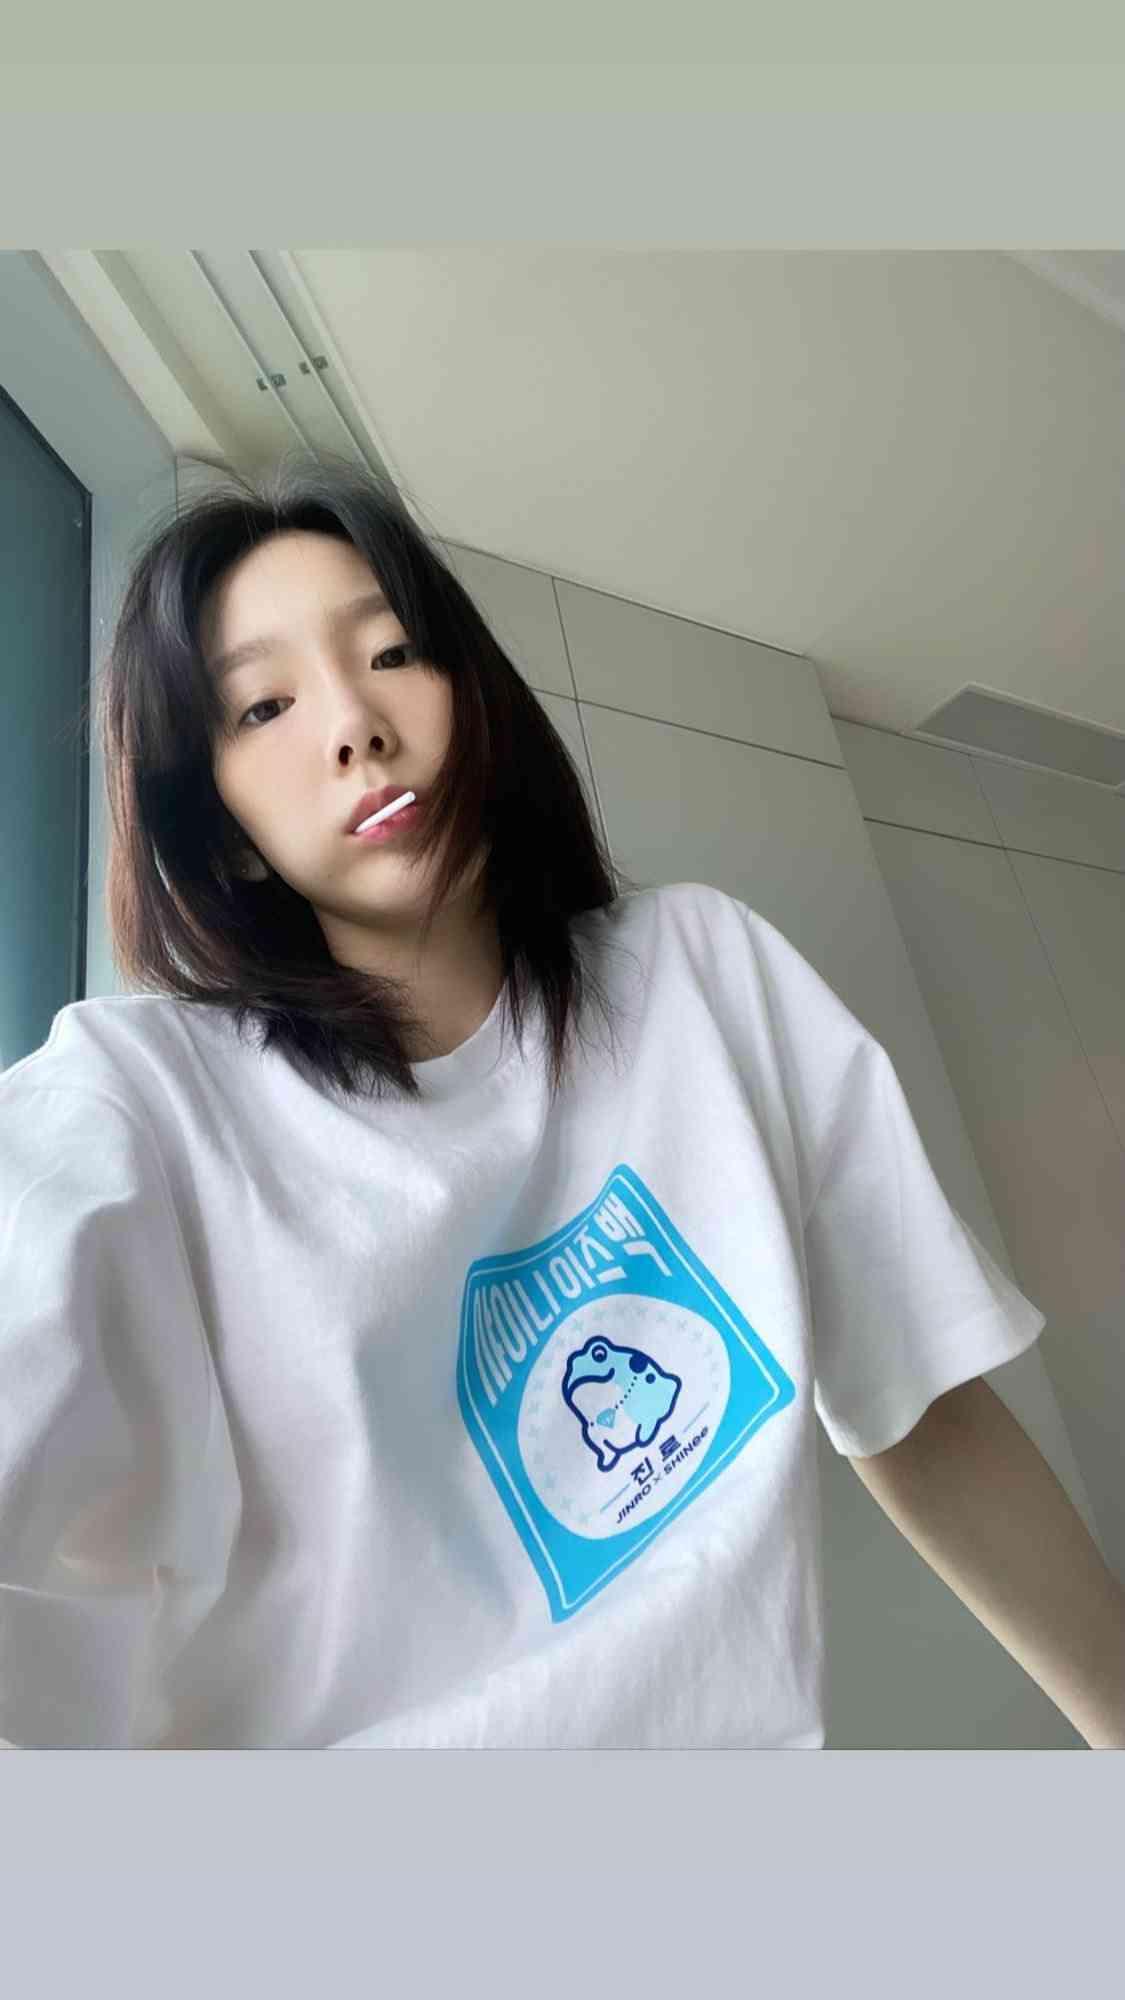 taeyeon_ss_2550165508129786683_StorySaver_image.jpg